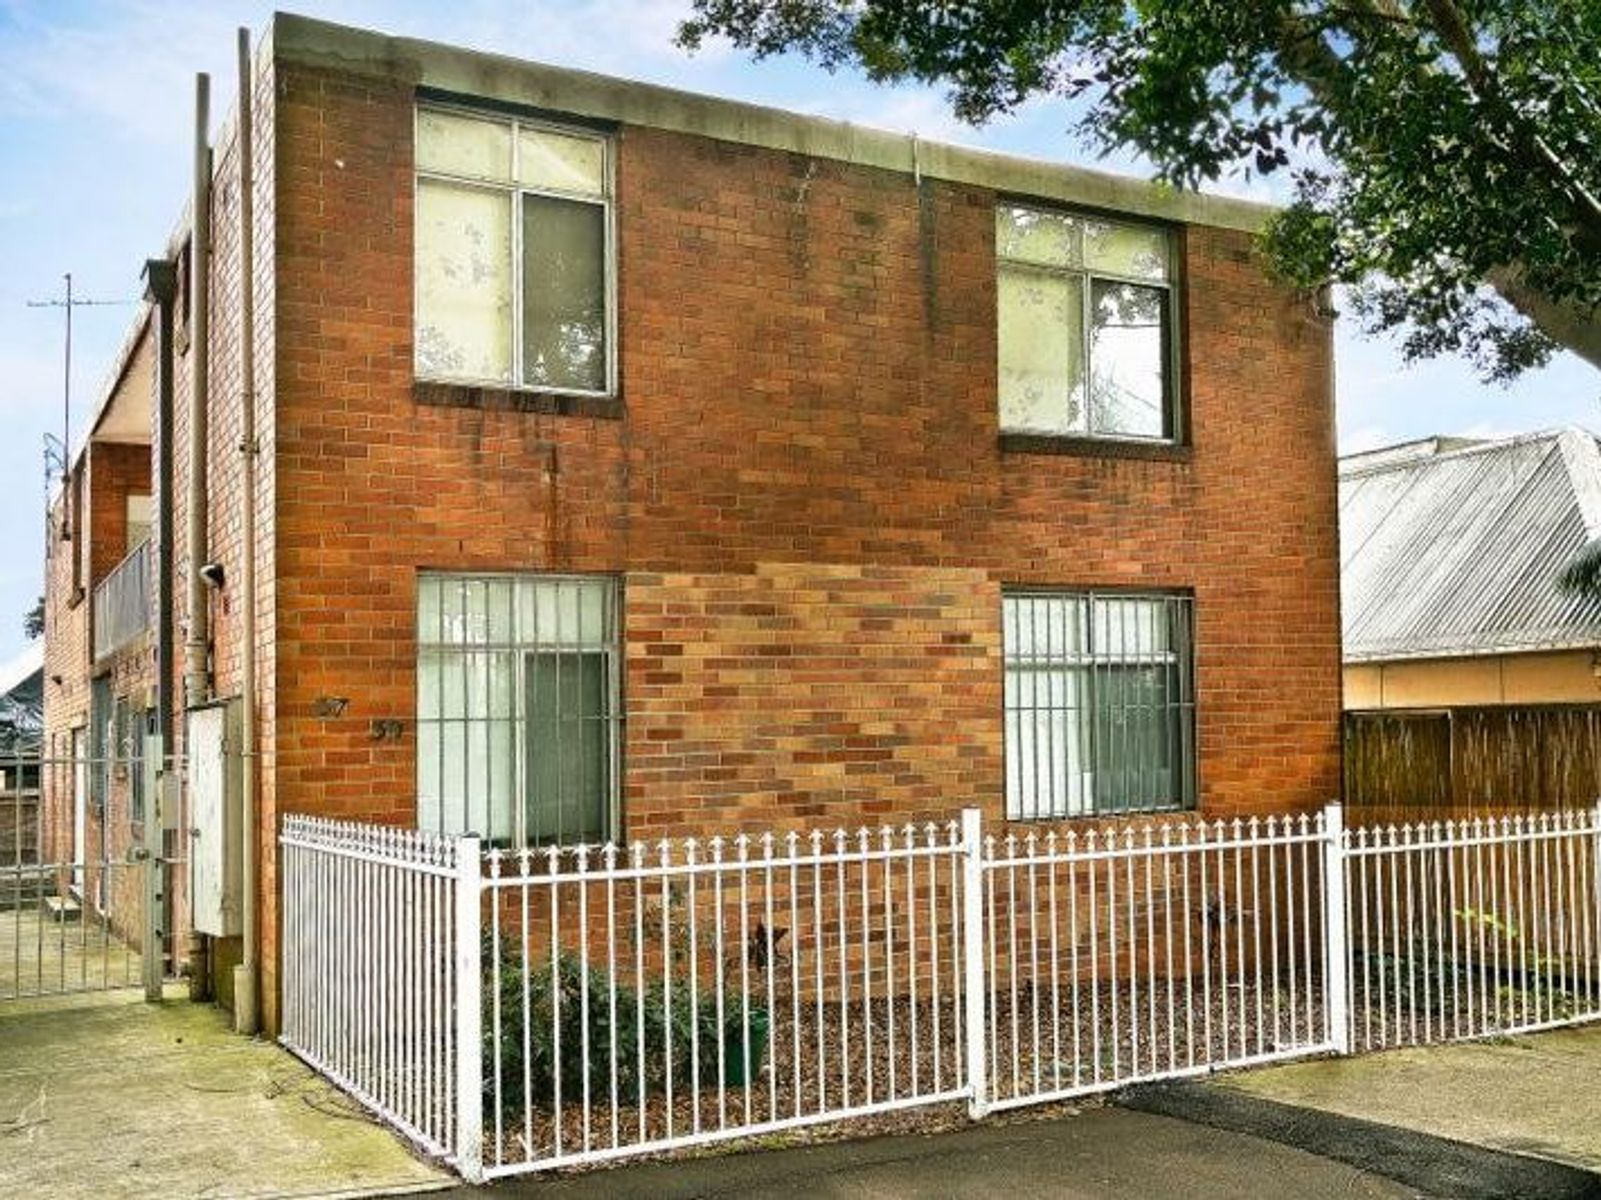 4/37 Northwood Street, Camperdown, NSW 2050